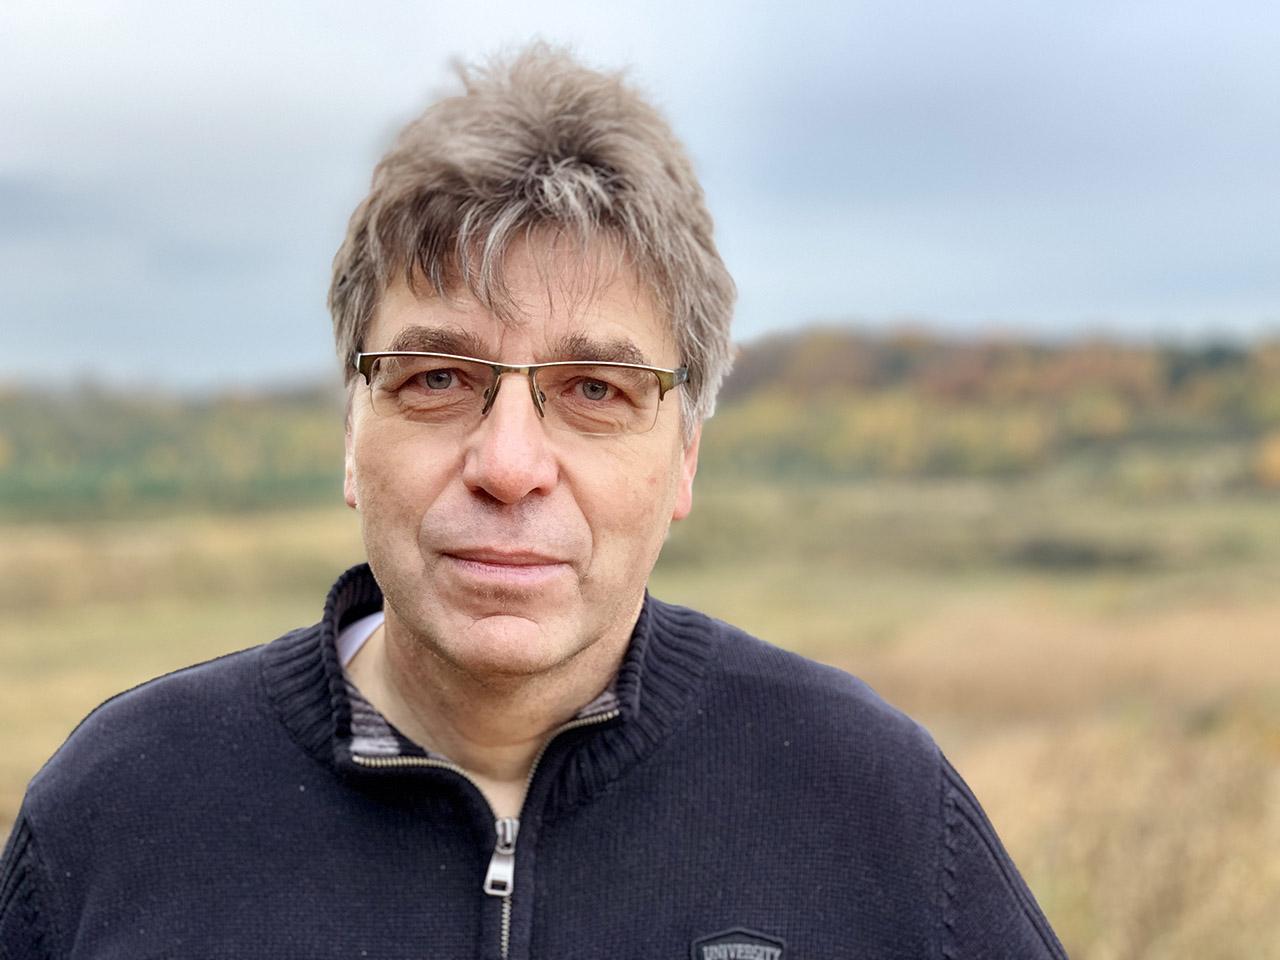 Thorsten Gajewi